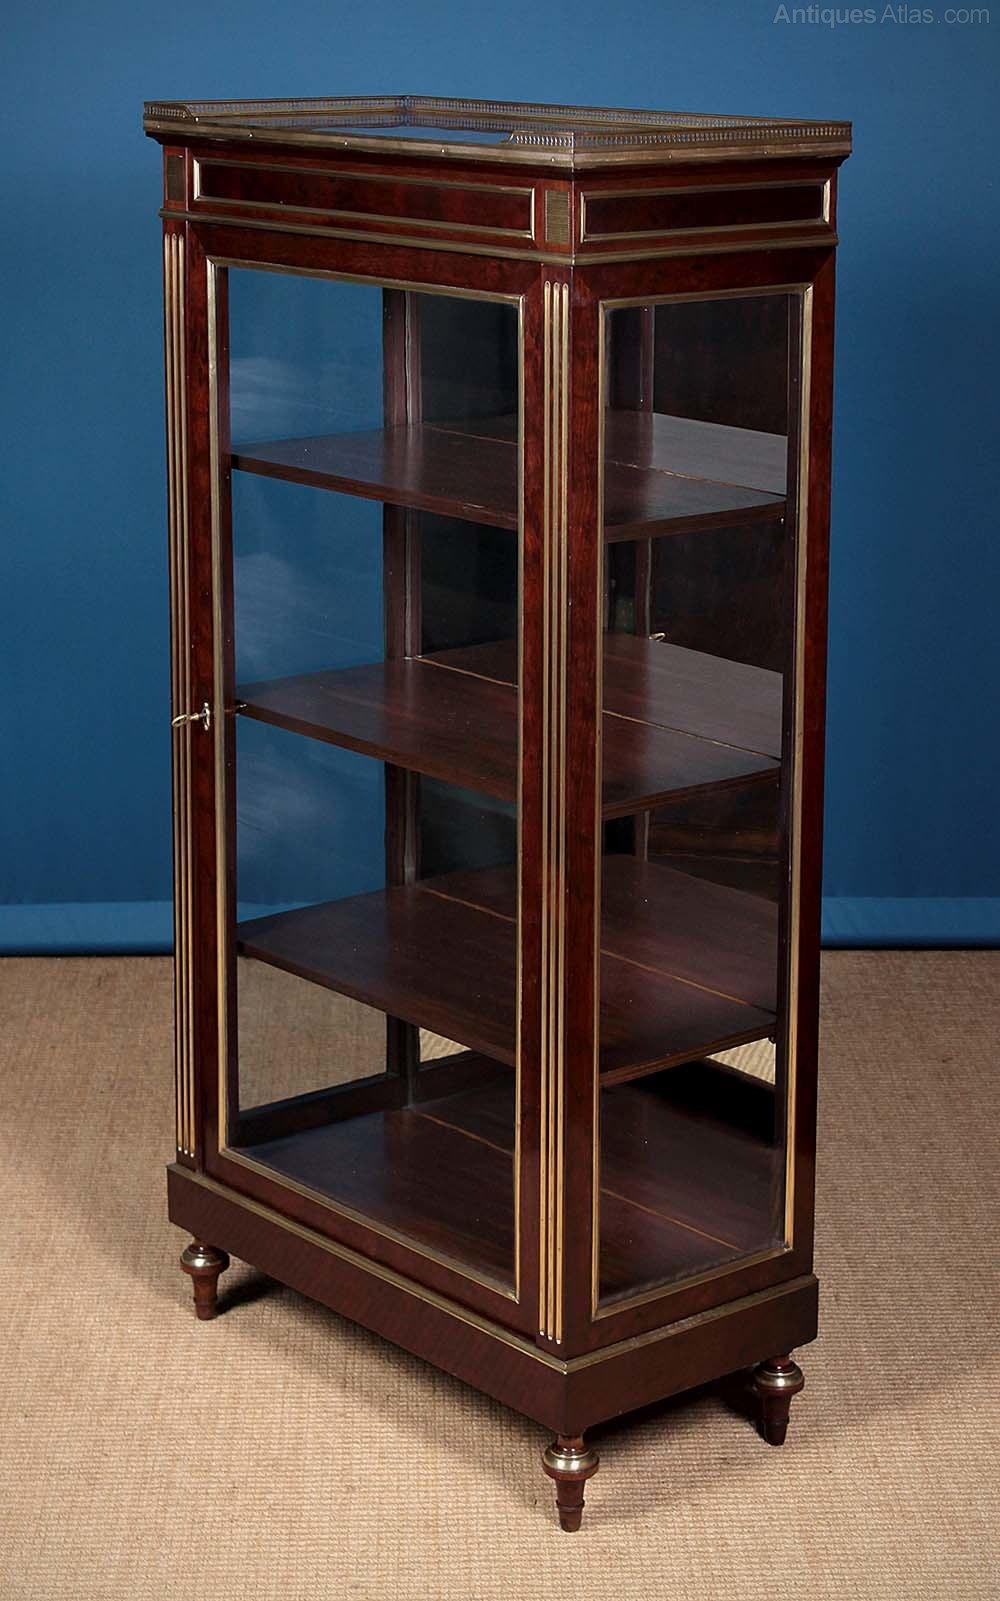 brass mounted vitrine display cabinet antiques atlas. Black Bedroom Furniture Sets. Home Design Ideas